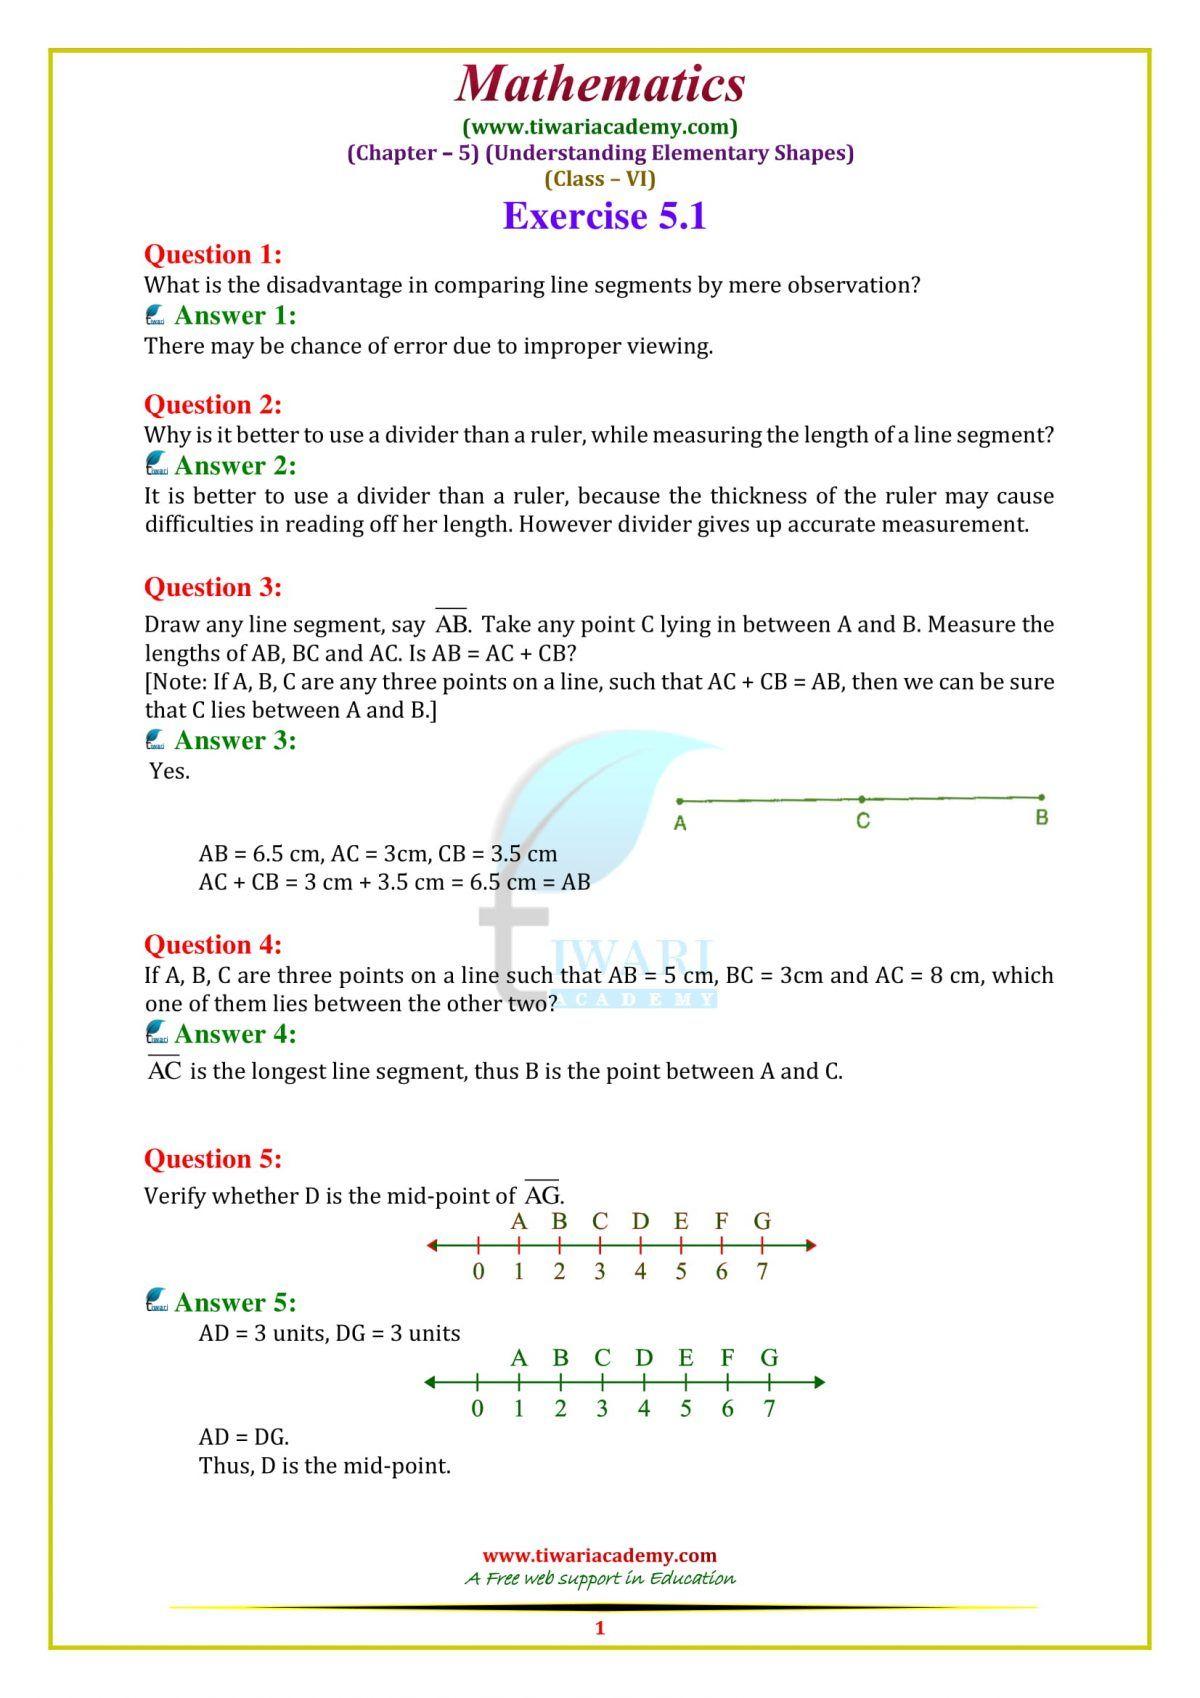 Ncert Solutions For Class 6 Maths Chapter 5 Exercise 5 1 In English Medium Class 6 Maths Math Chapter [ 1698 x 1200 Pixel ]